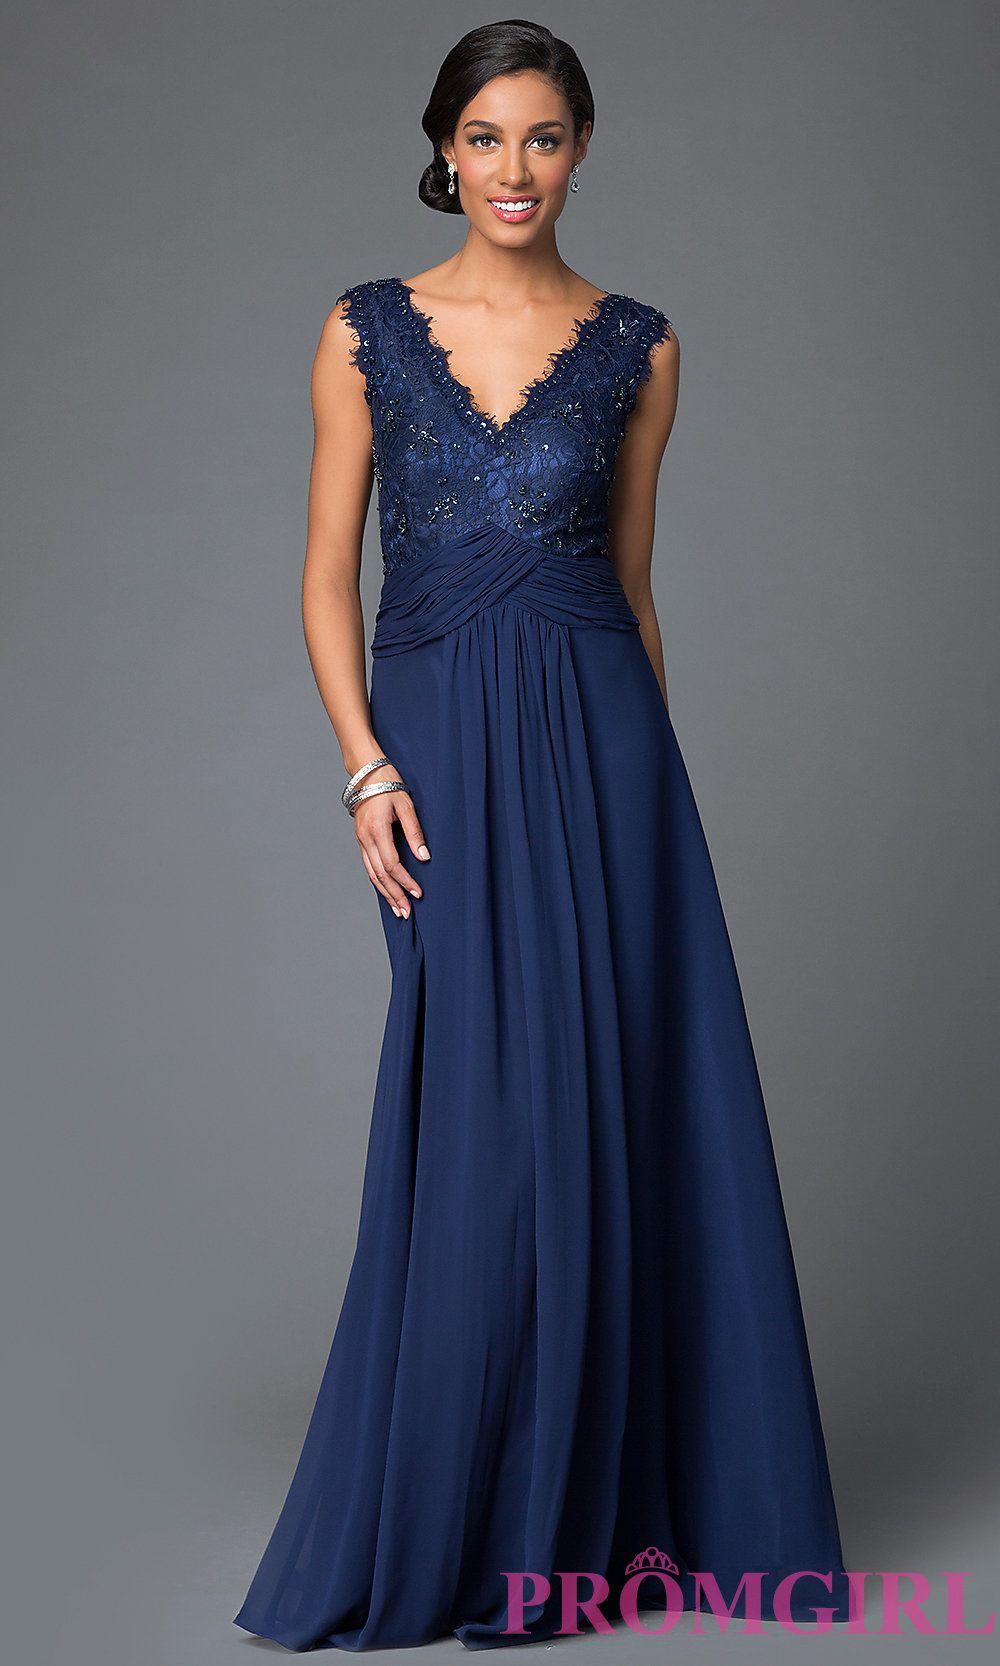 MOB Formal Long Sleeveless Dress